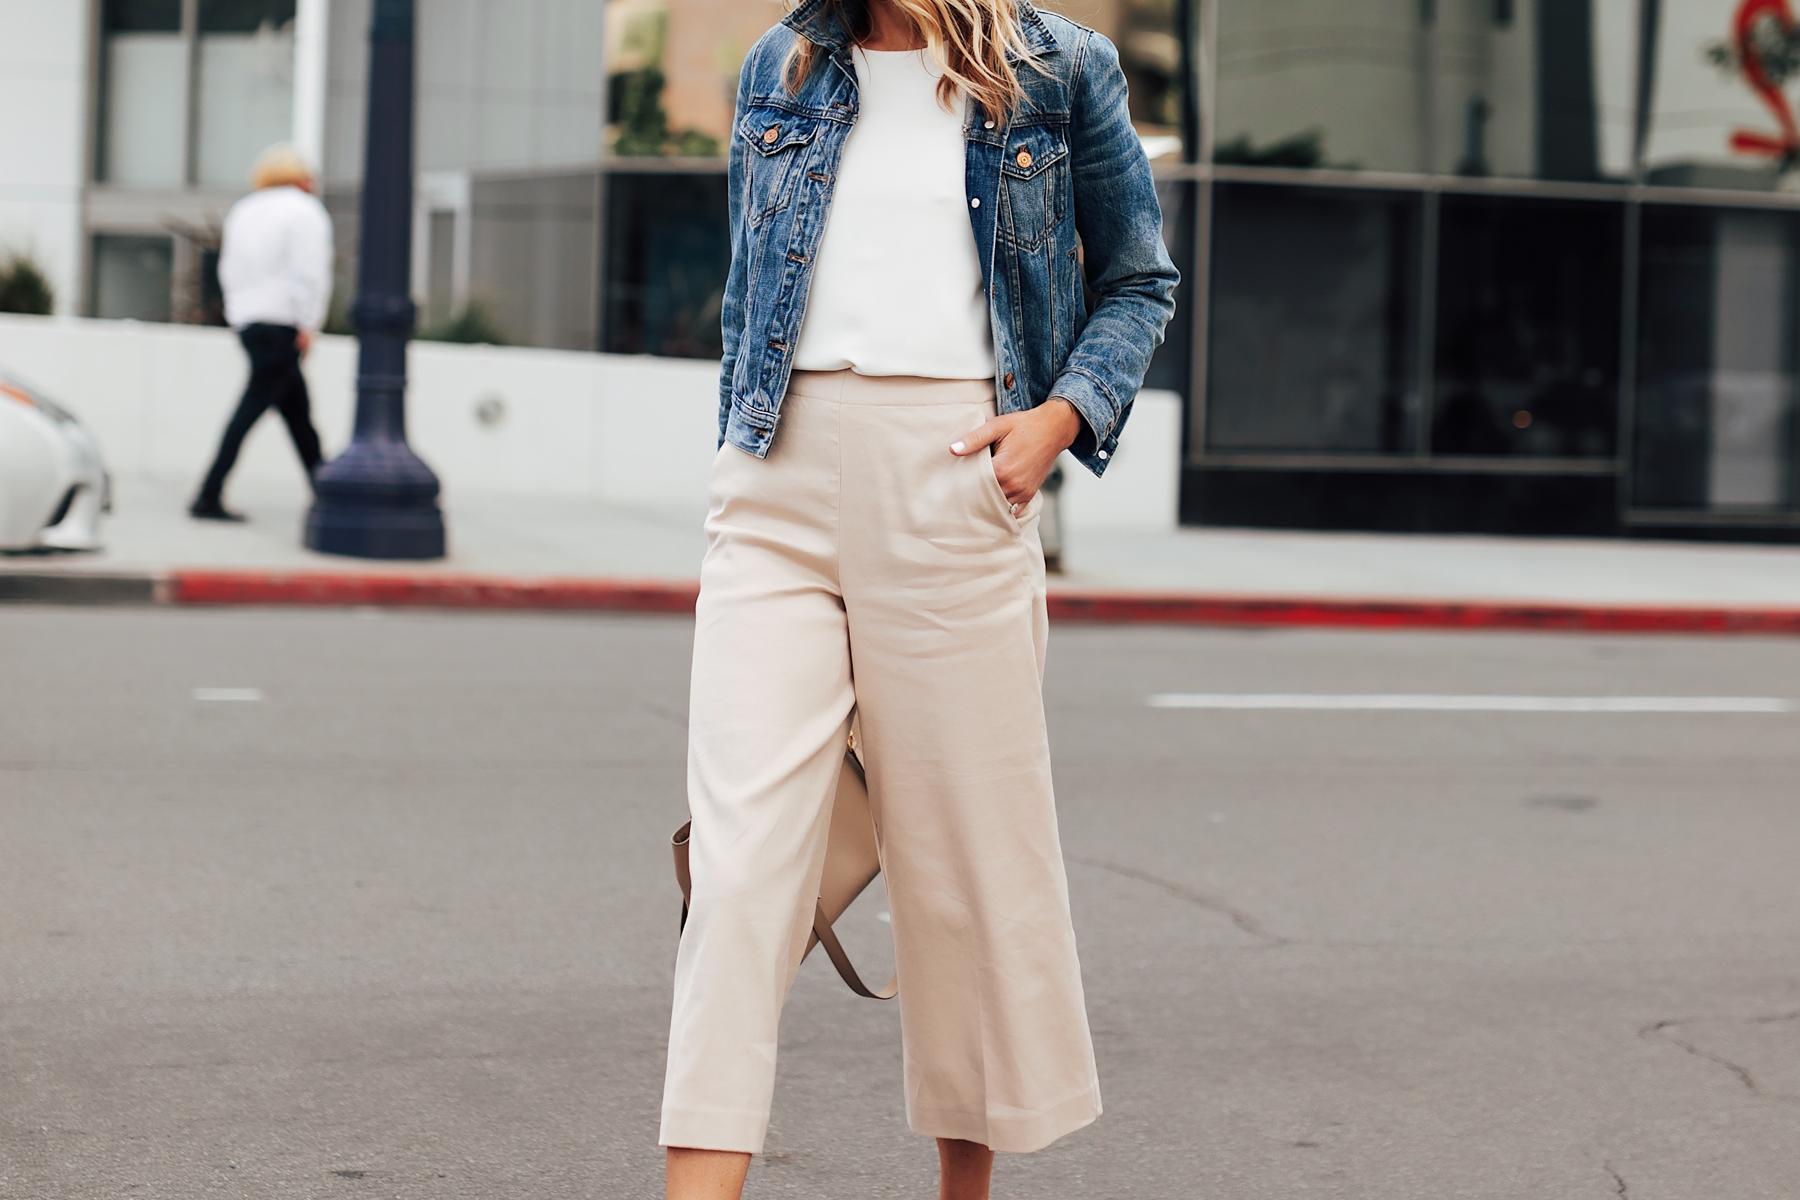 Fashion Jackson Wearing Denim Jacket White Top Khaki Cropped Pants